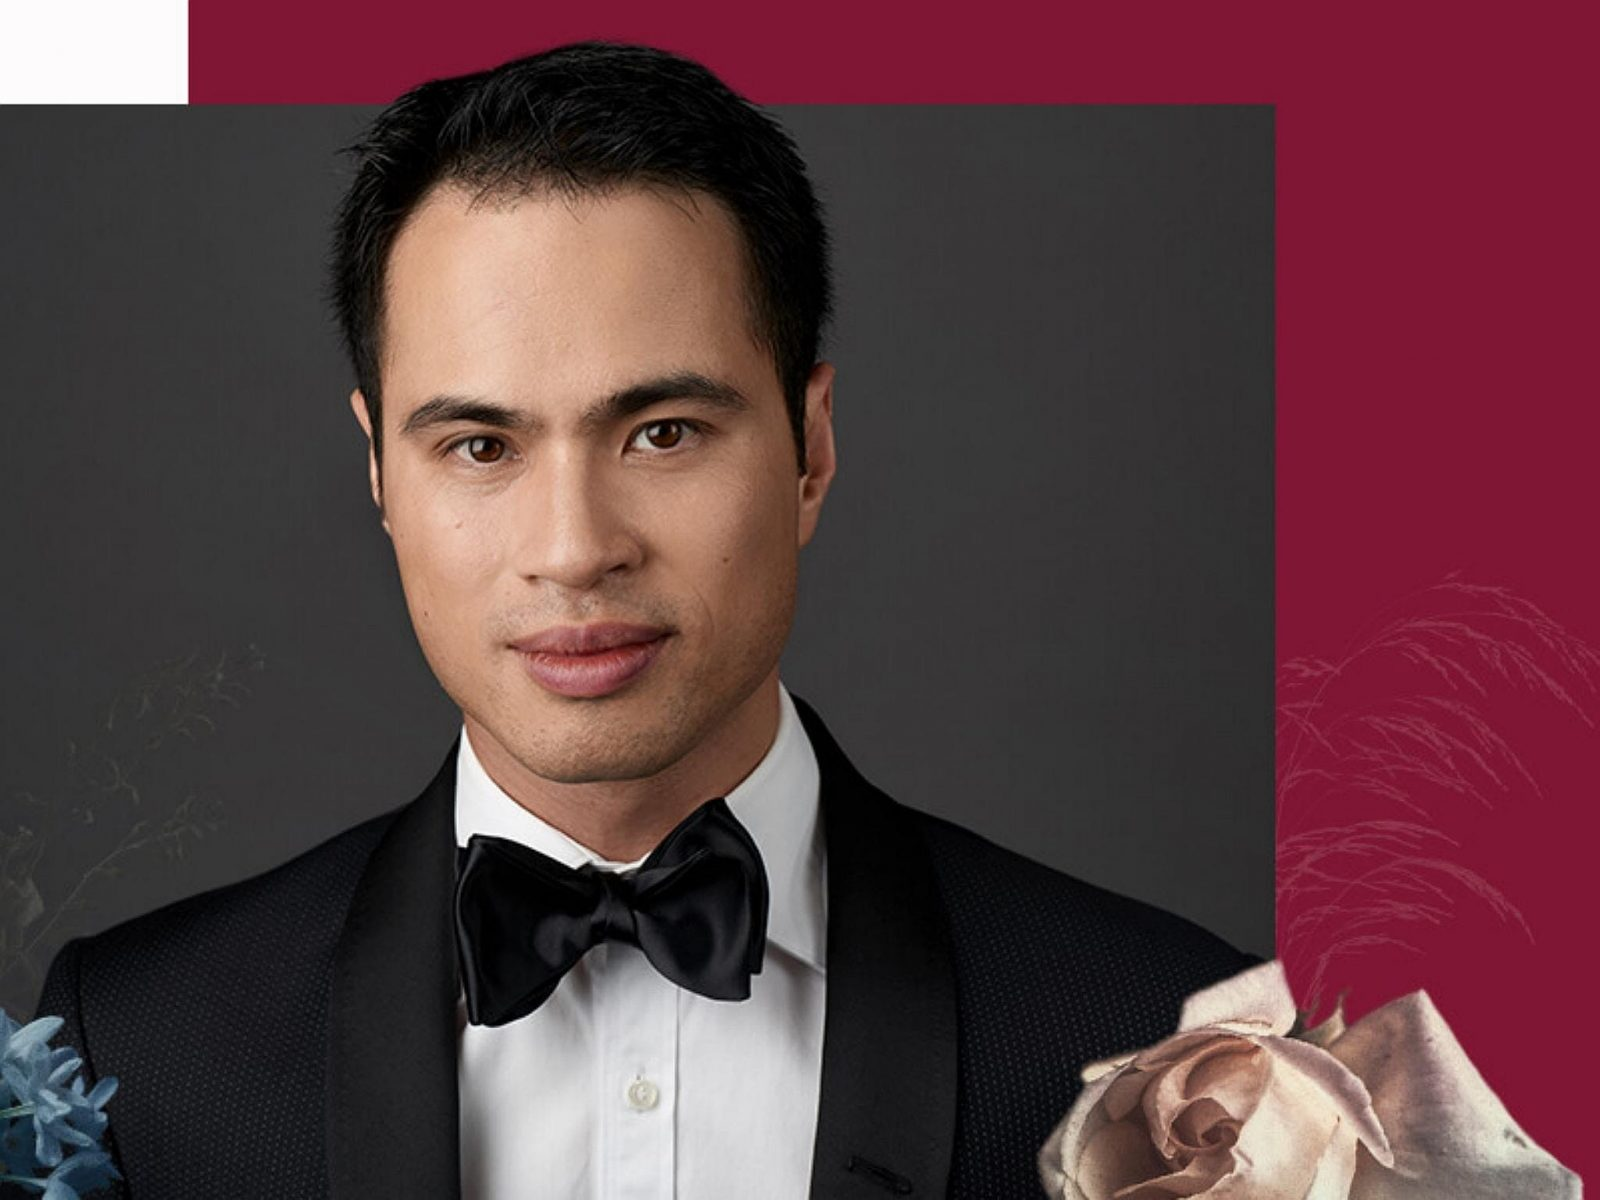 Mozart/Salieri